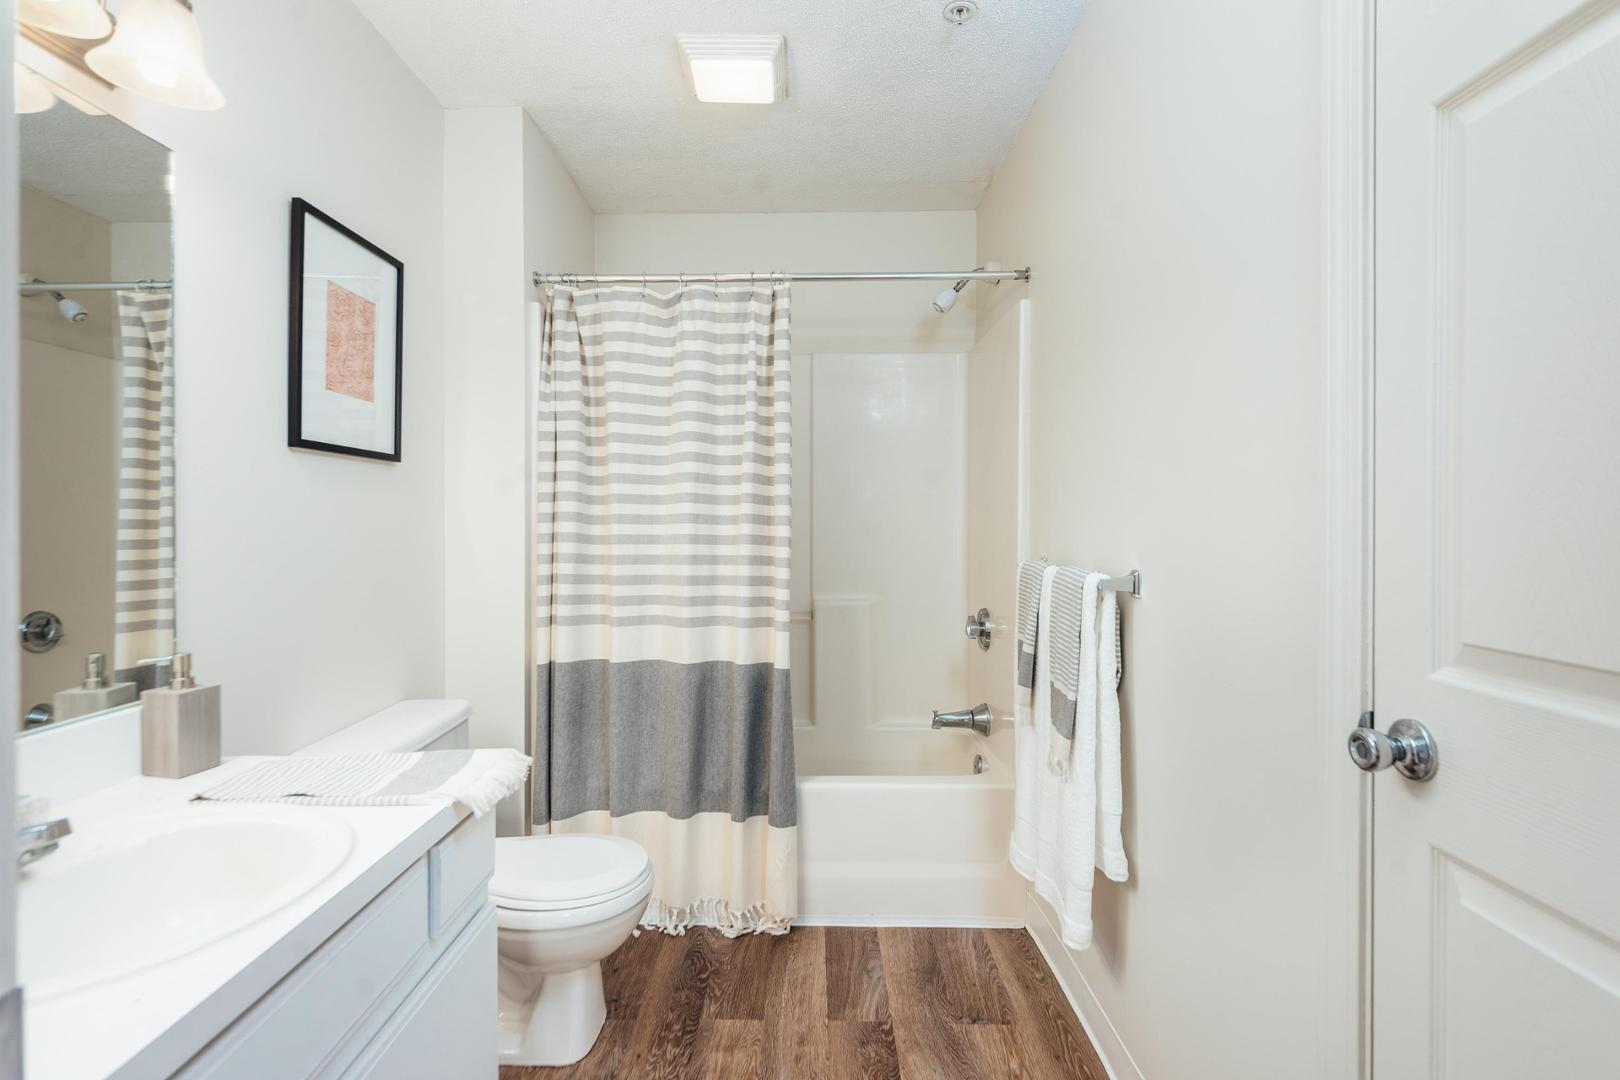 7 Archstone Avenue #T0509, Tewksbury, MA - $1,795 USD/ month